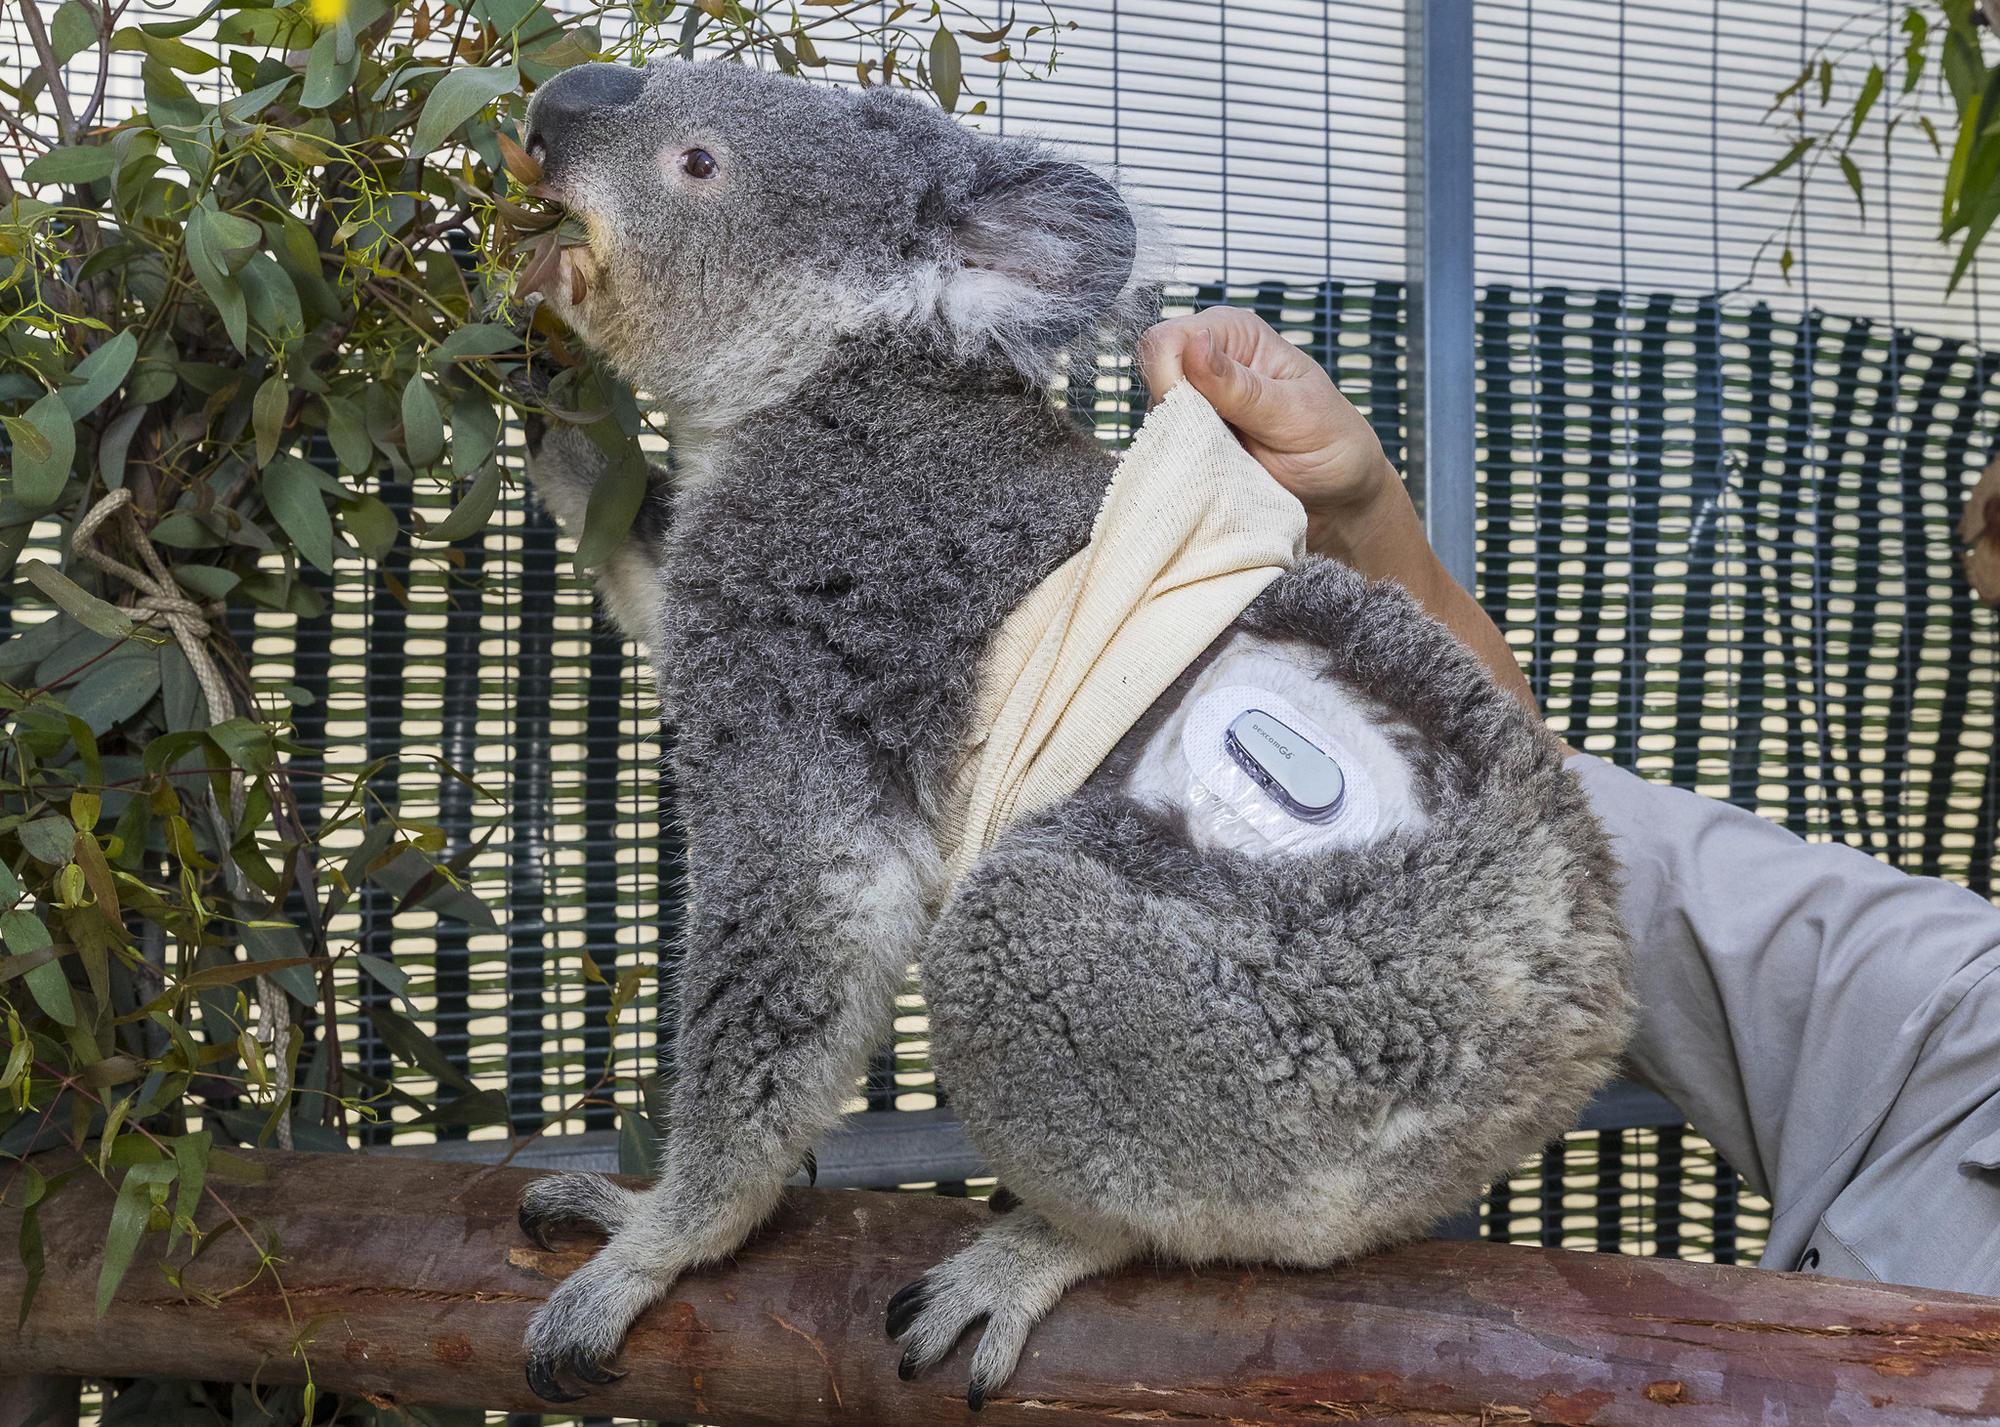 Quincy The San Diego Zoo S Diabetic Koala Gets Help From